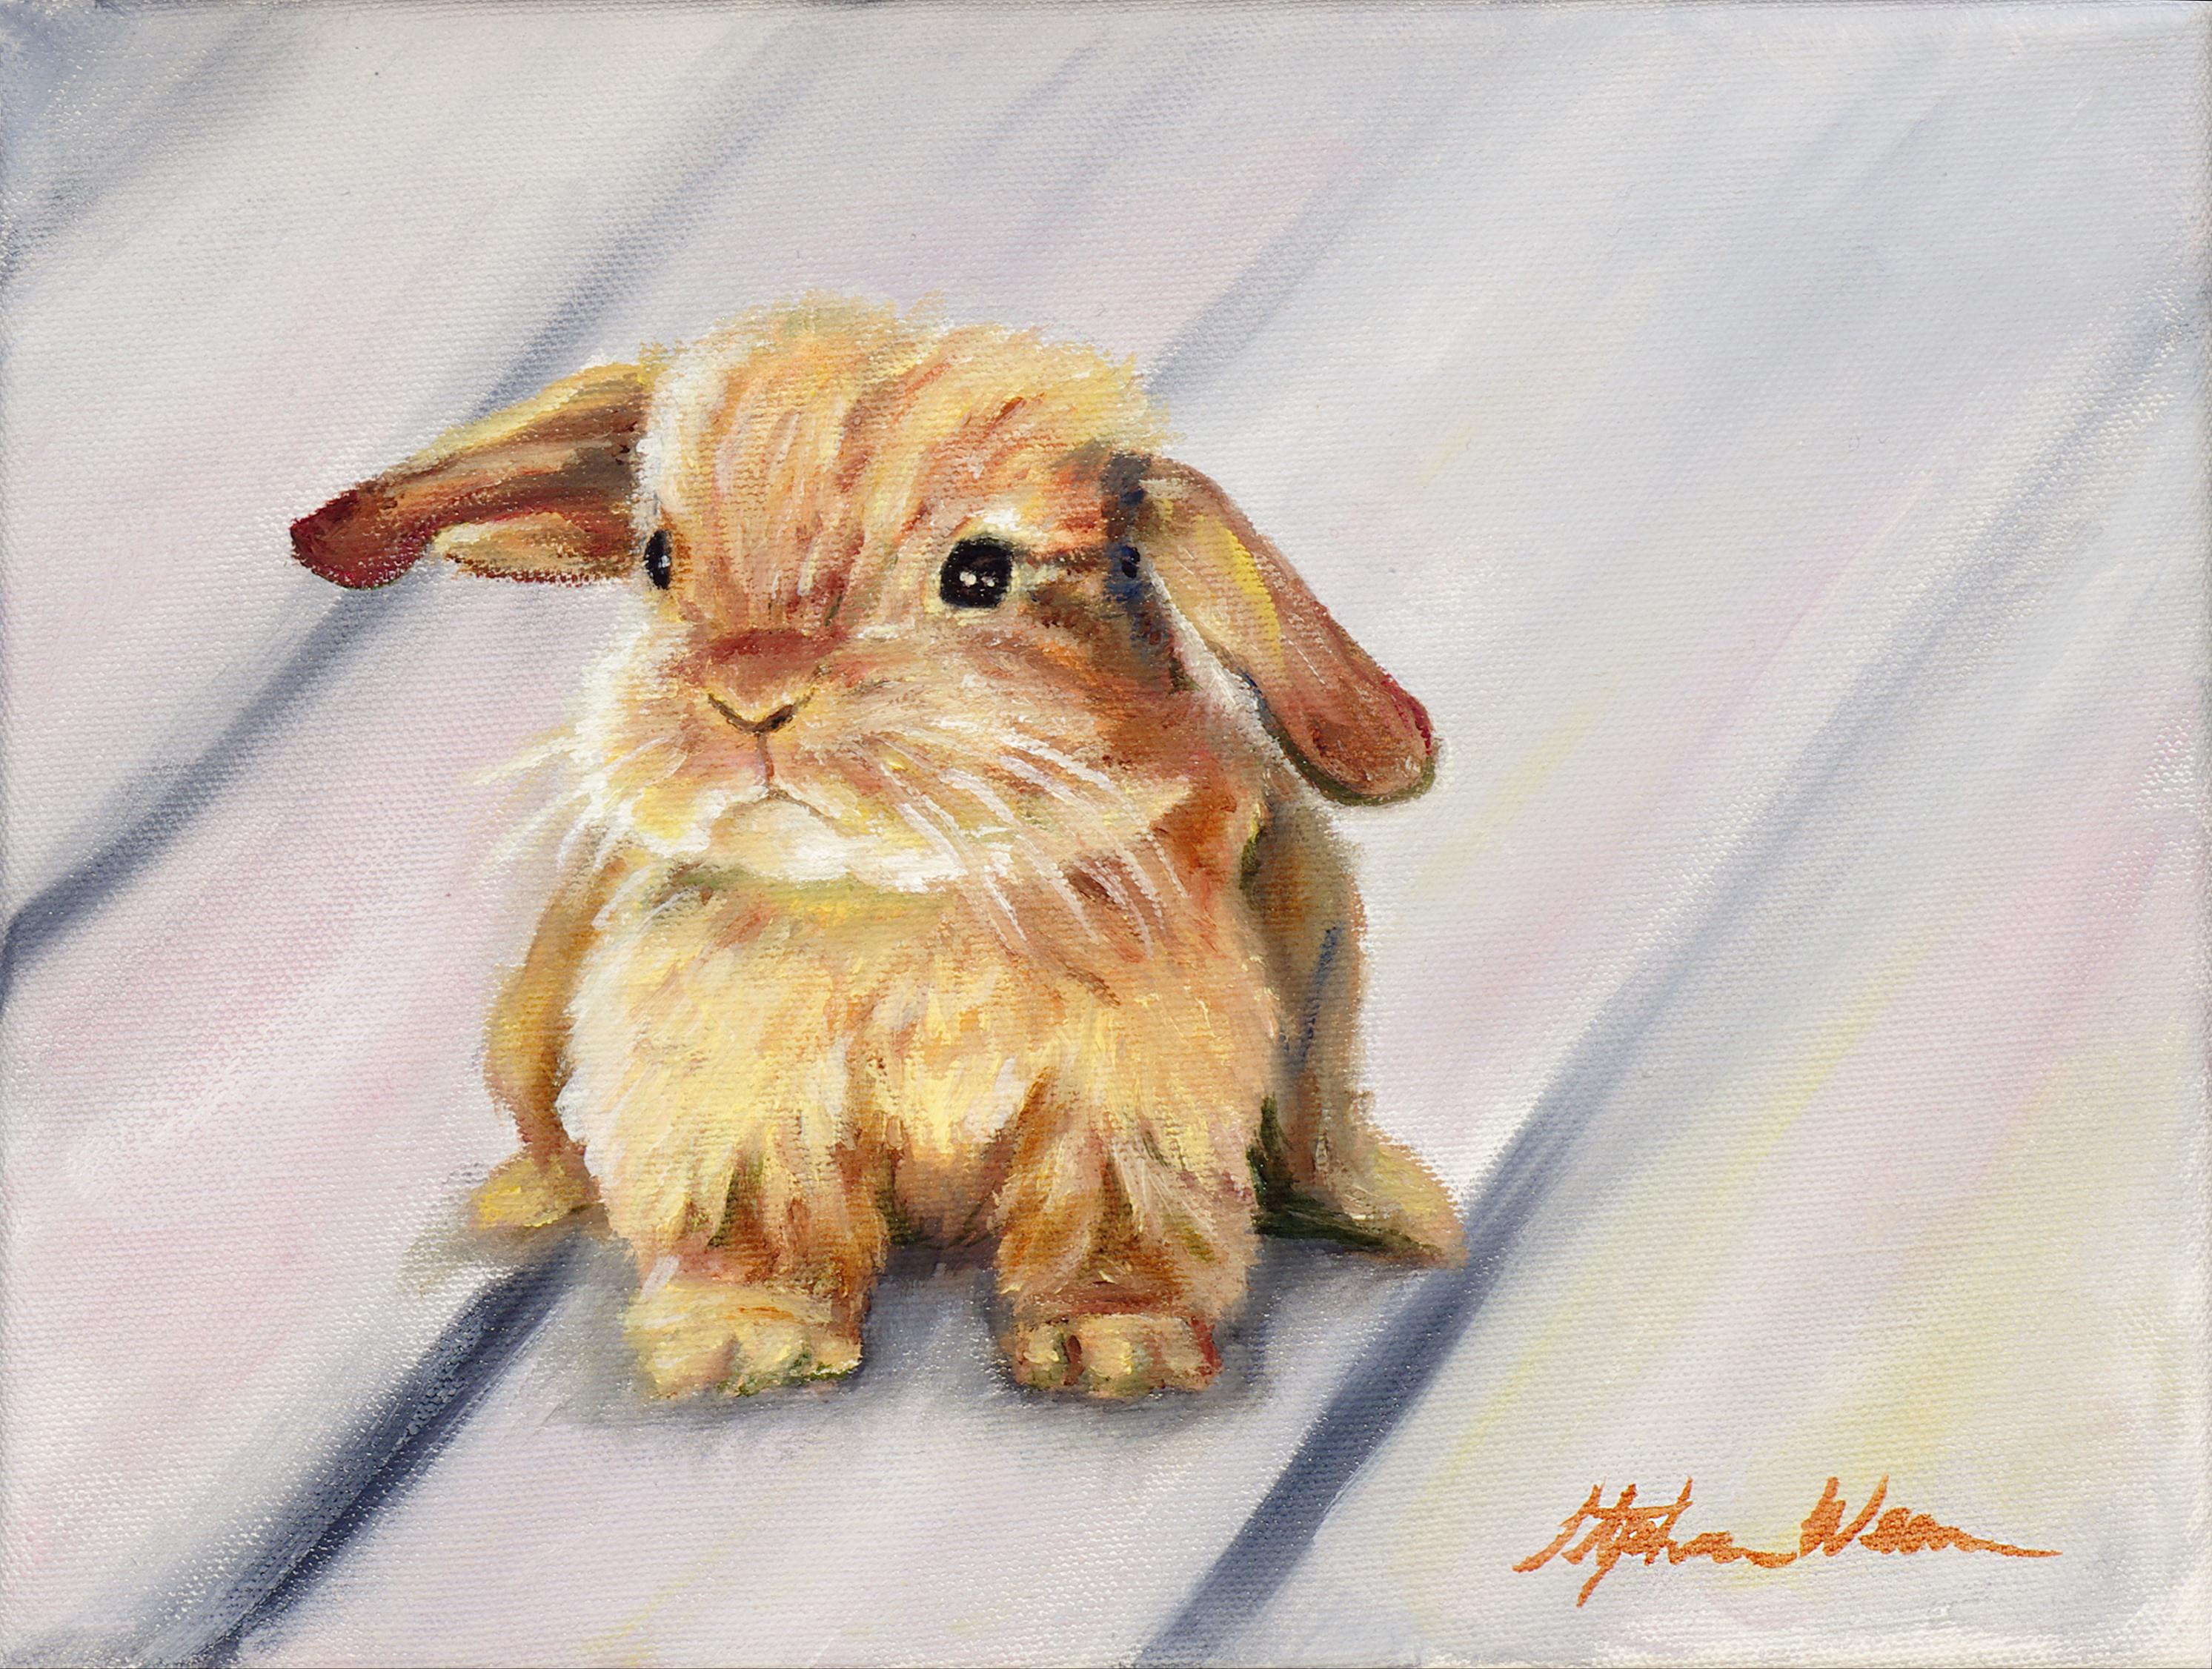 Bunny zonngk